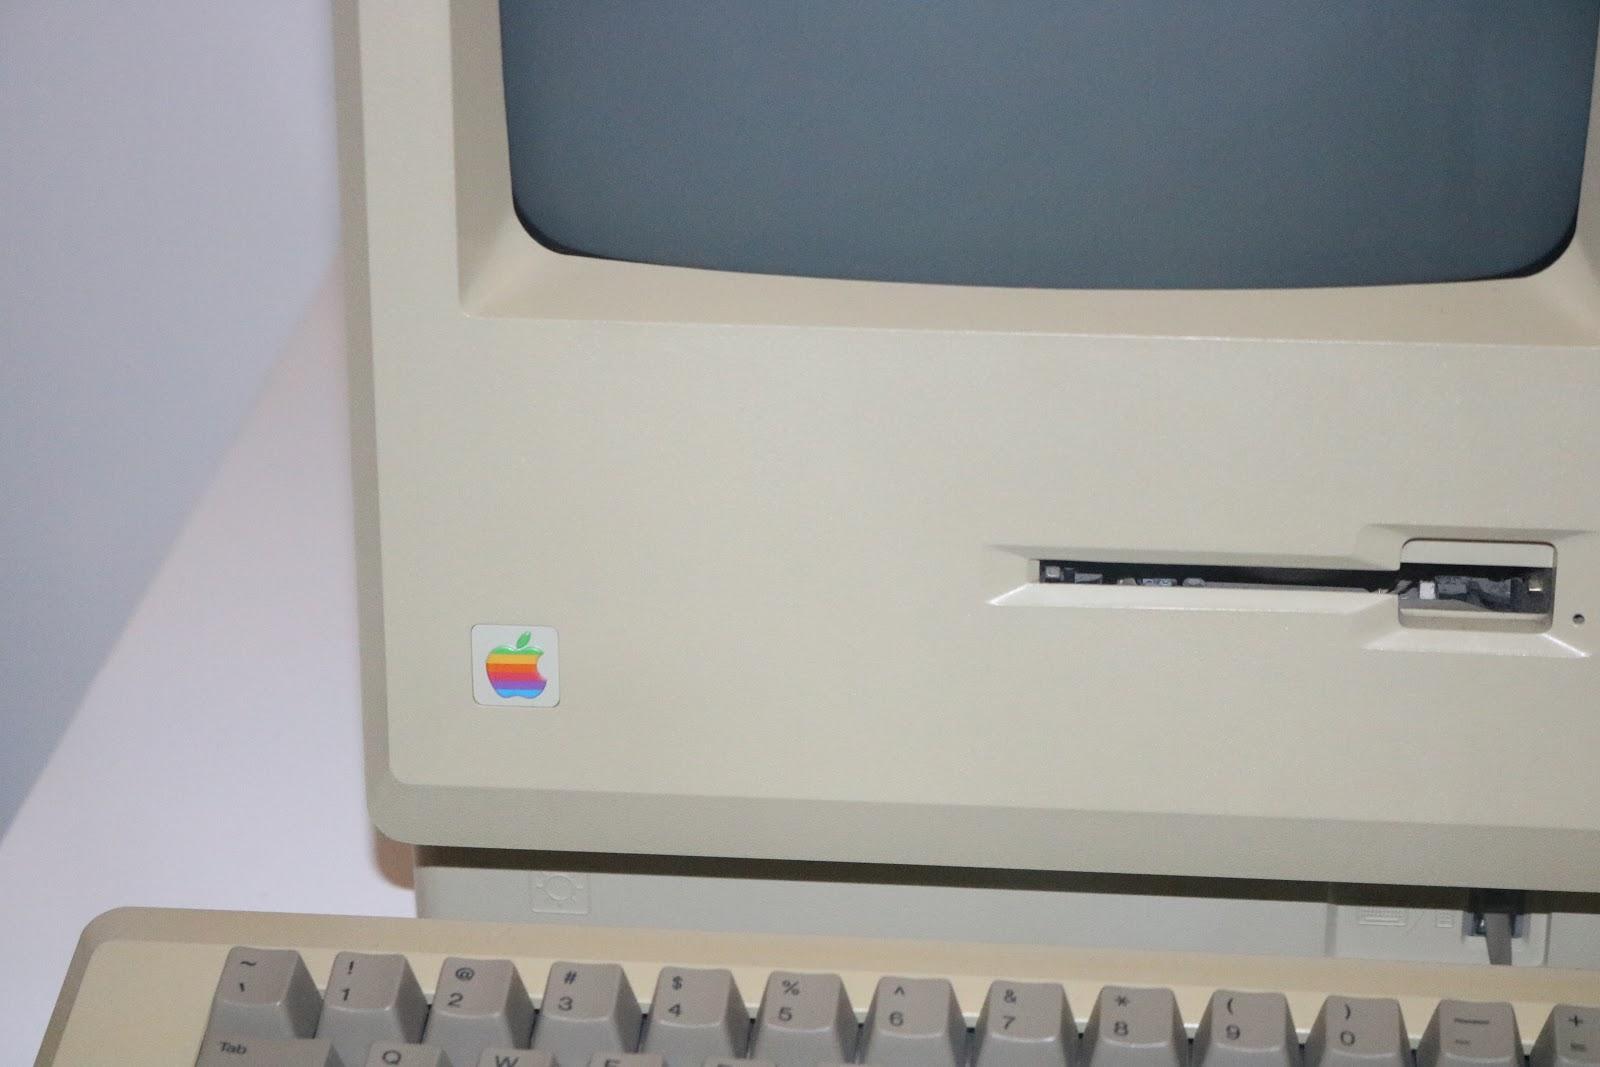 Old Mac Computer